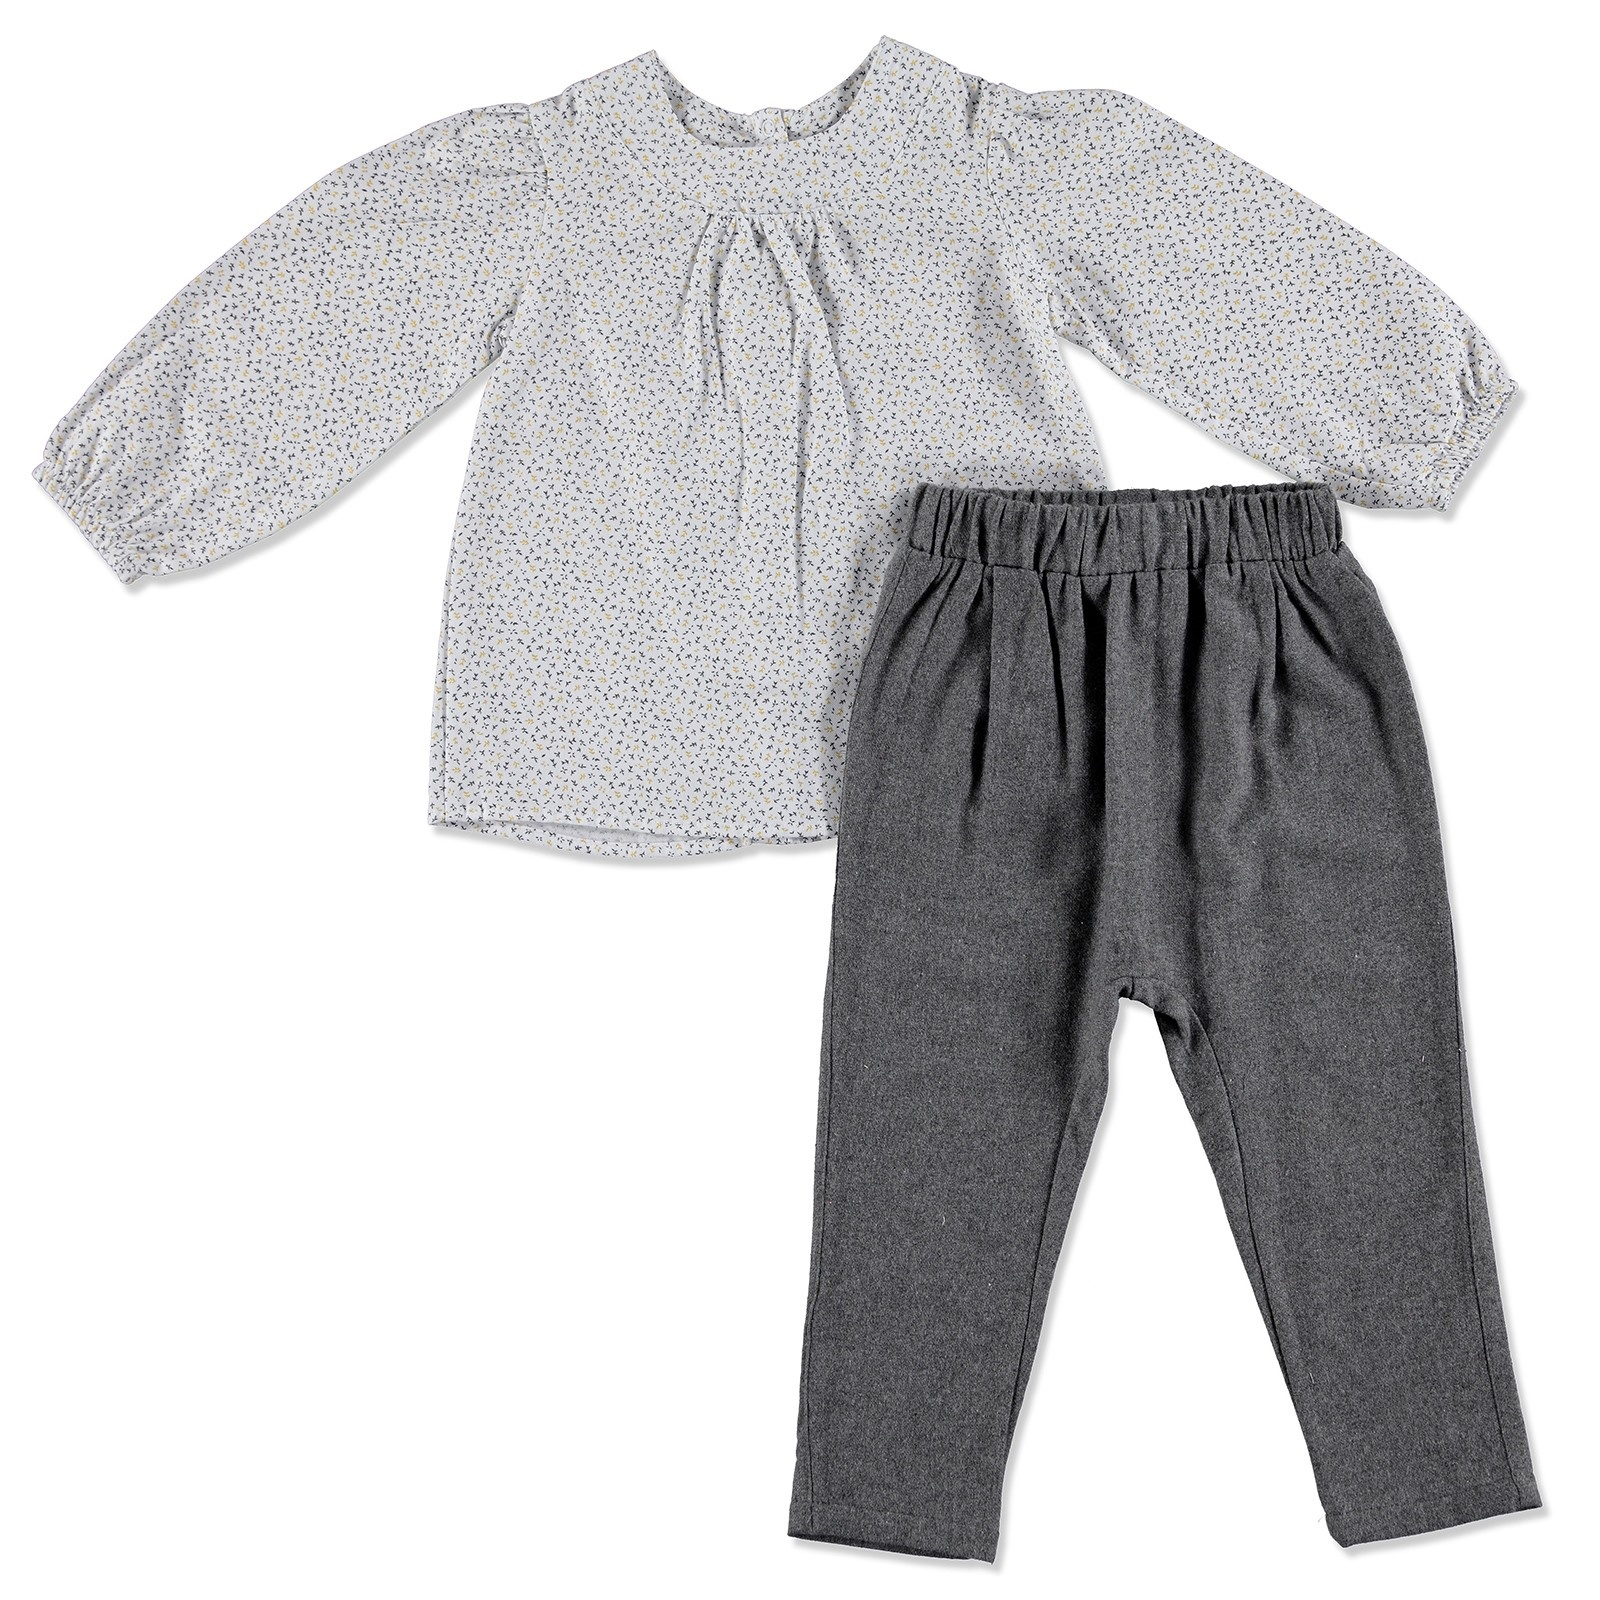 Ebebek HelloBaby Yellow Flower Theme Baby Texture Shirt Trousers Set